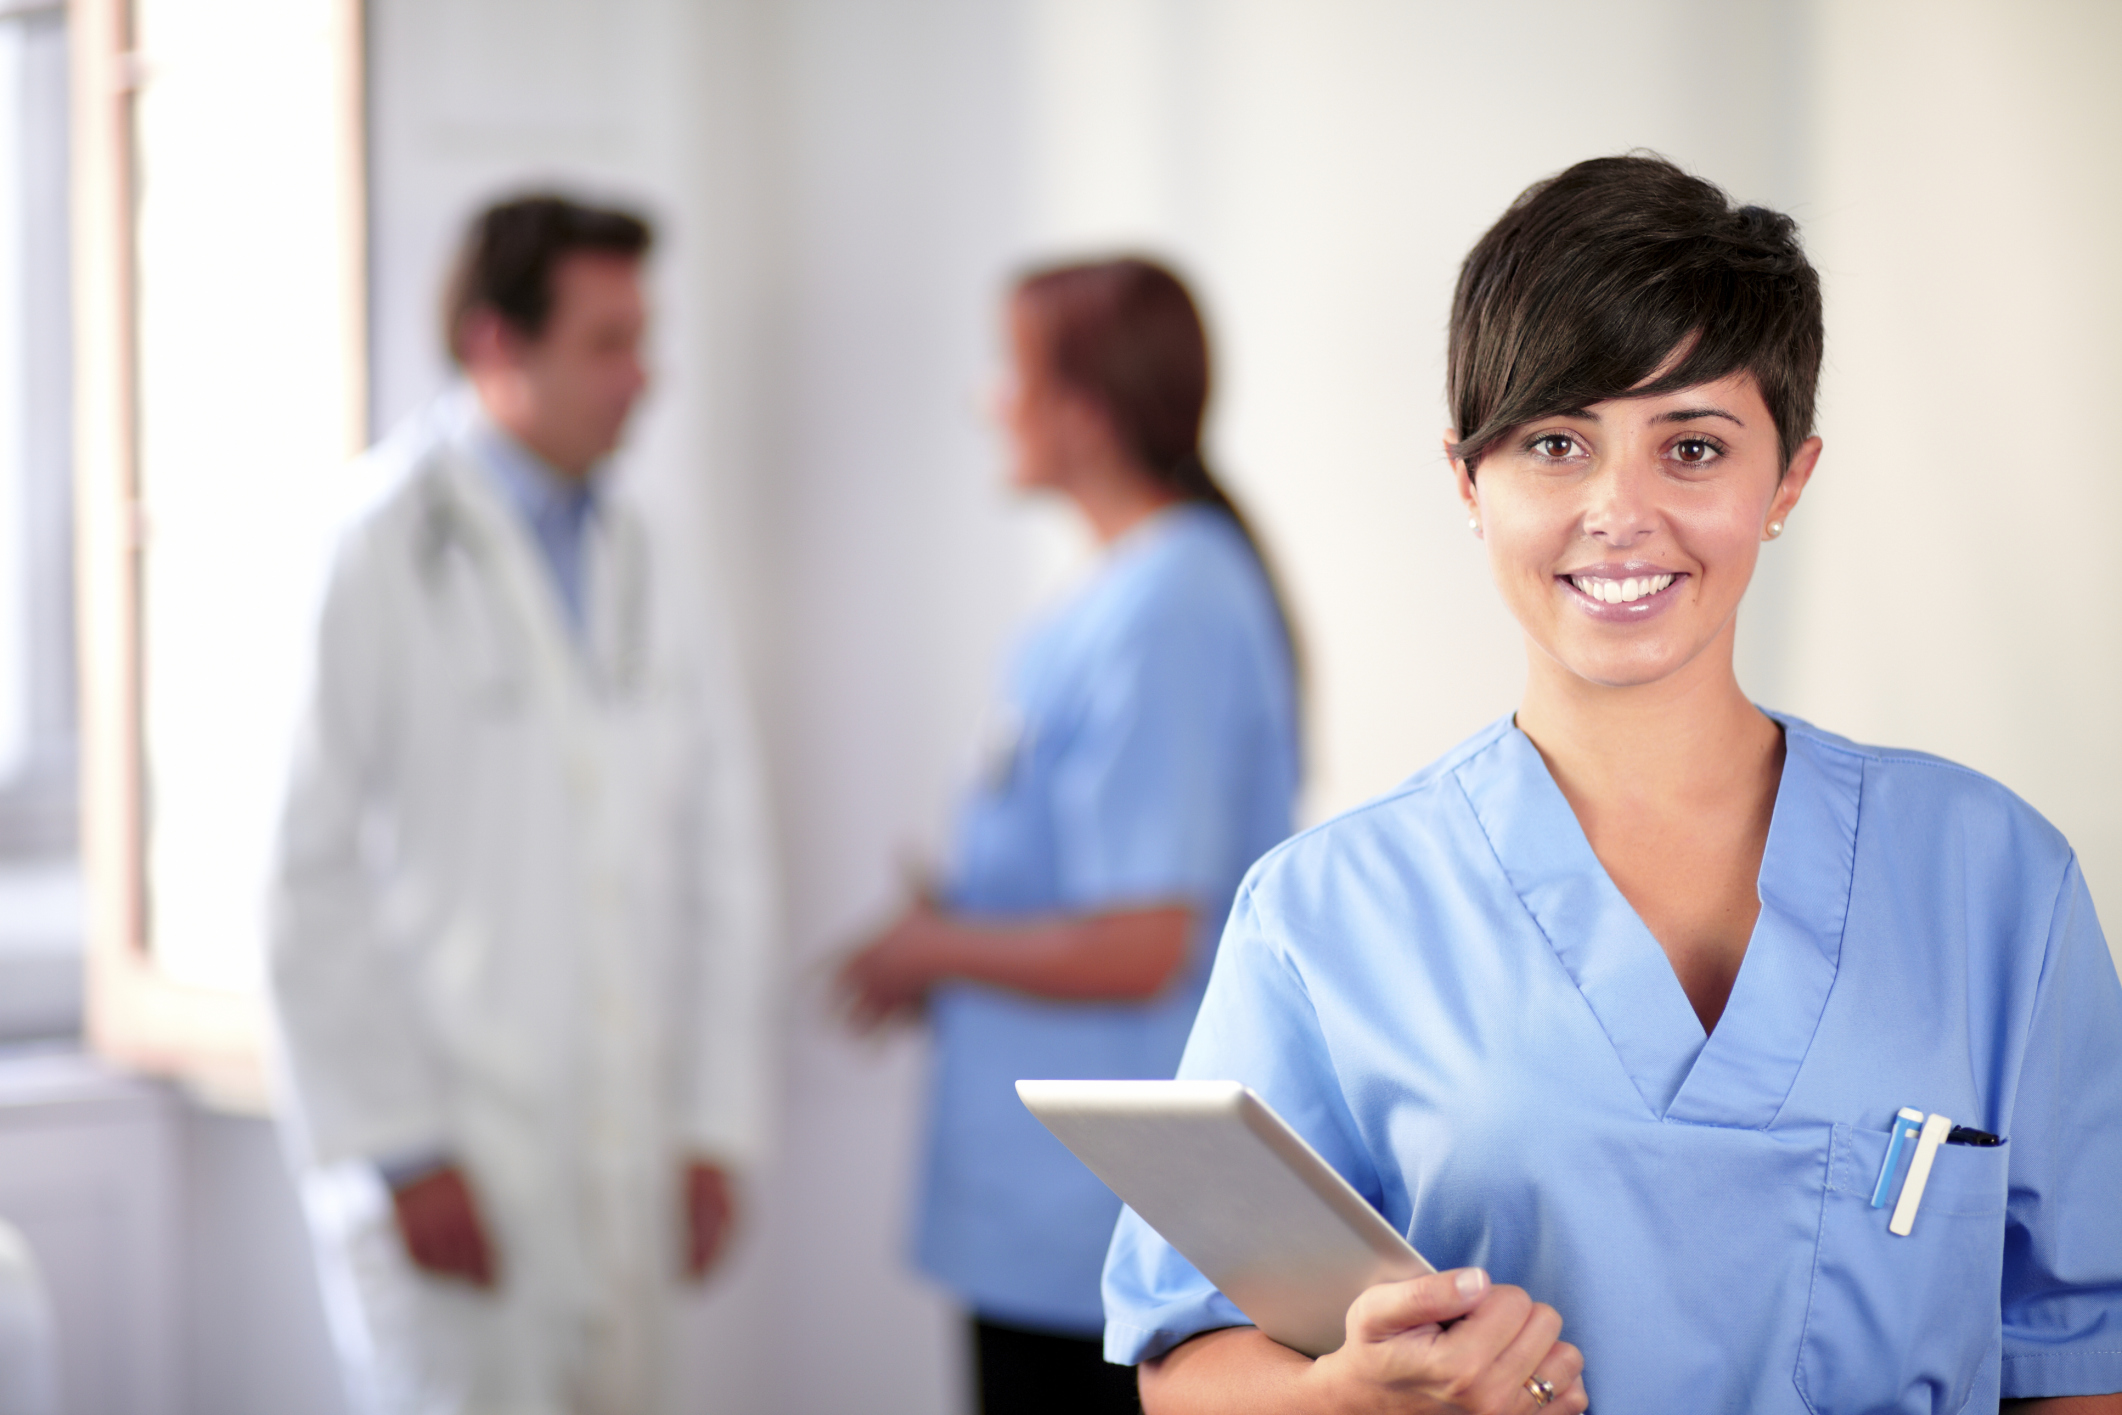 nurses working in hospital, rn to bsn